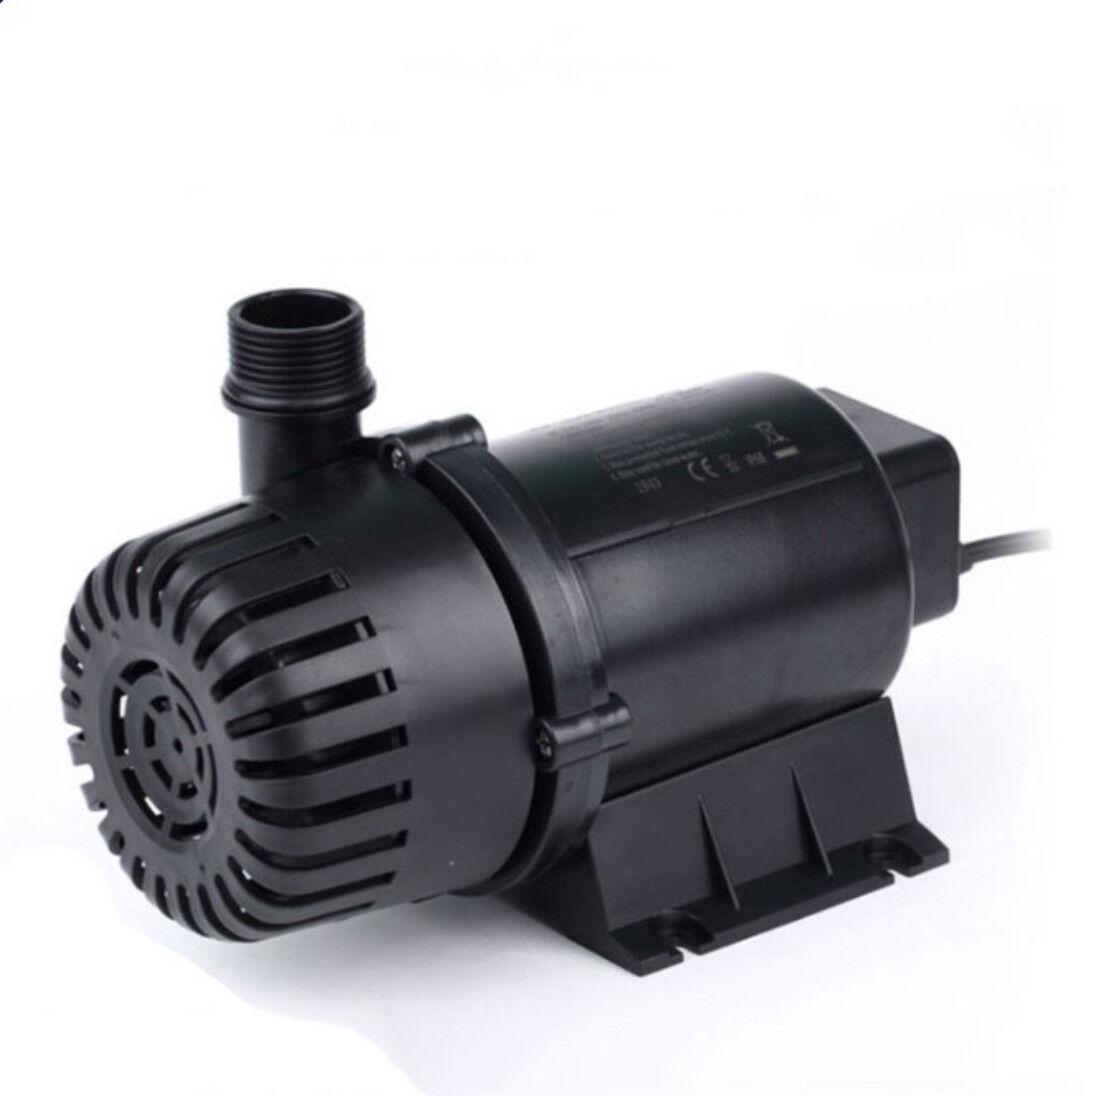 Resun Water Pump PG18000 250W Submersible Pump For Aquarium Fish Hydroponics